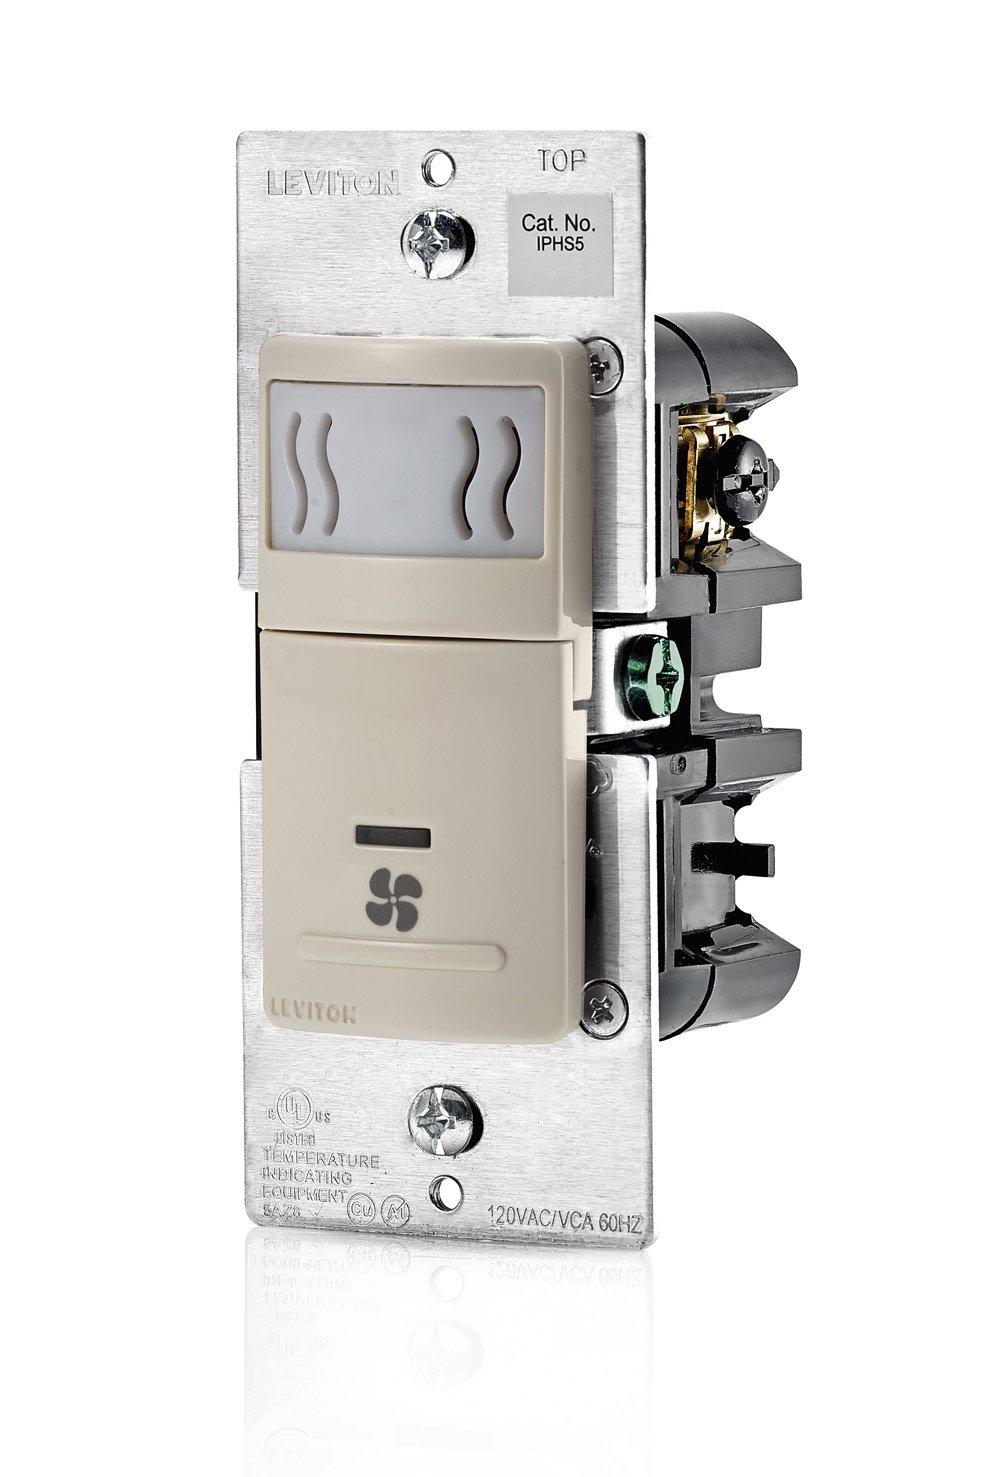 Leviton IPHS5-1LT Decora In-Wall Humidity Sensor & Fan Control , 3A, Single Pole, Light Almond